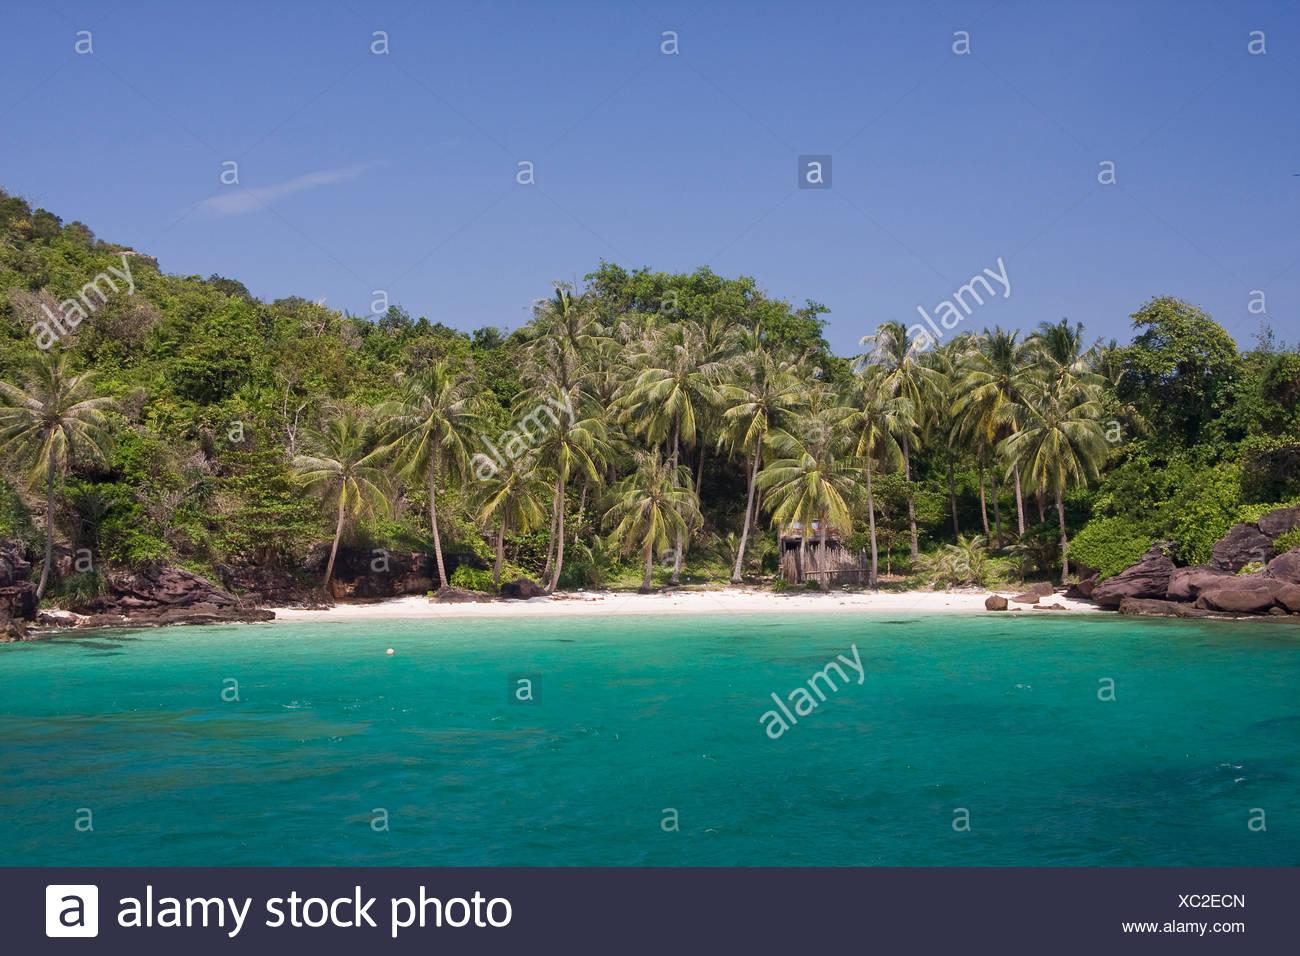 Ambiente de playa ambiente dream dream-like isla de vacaciones celestial como larga piscina palm Phu Quoc arenosos Vietnam Asia Imagen De Stock